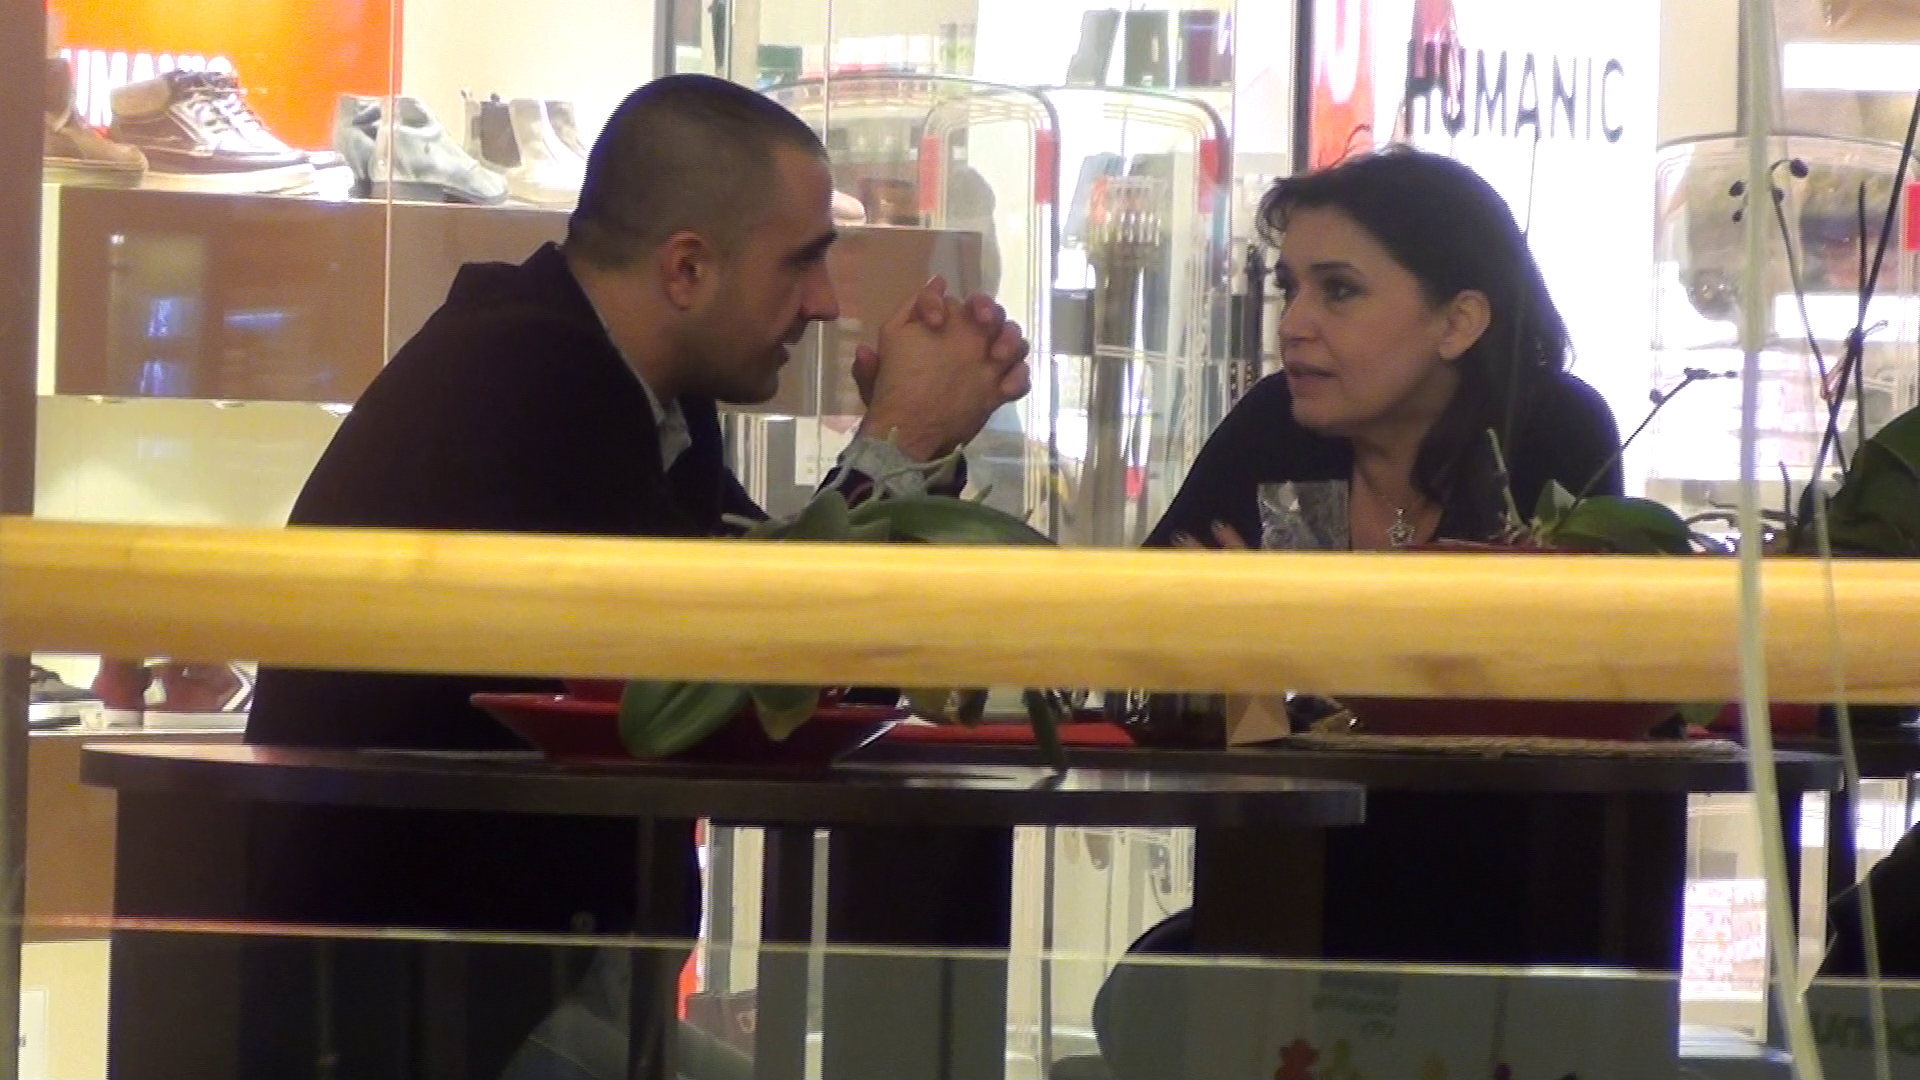 Geta Voinea, discutie aprinsa cu un barbat la mall